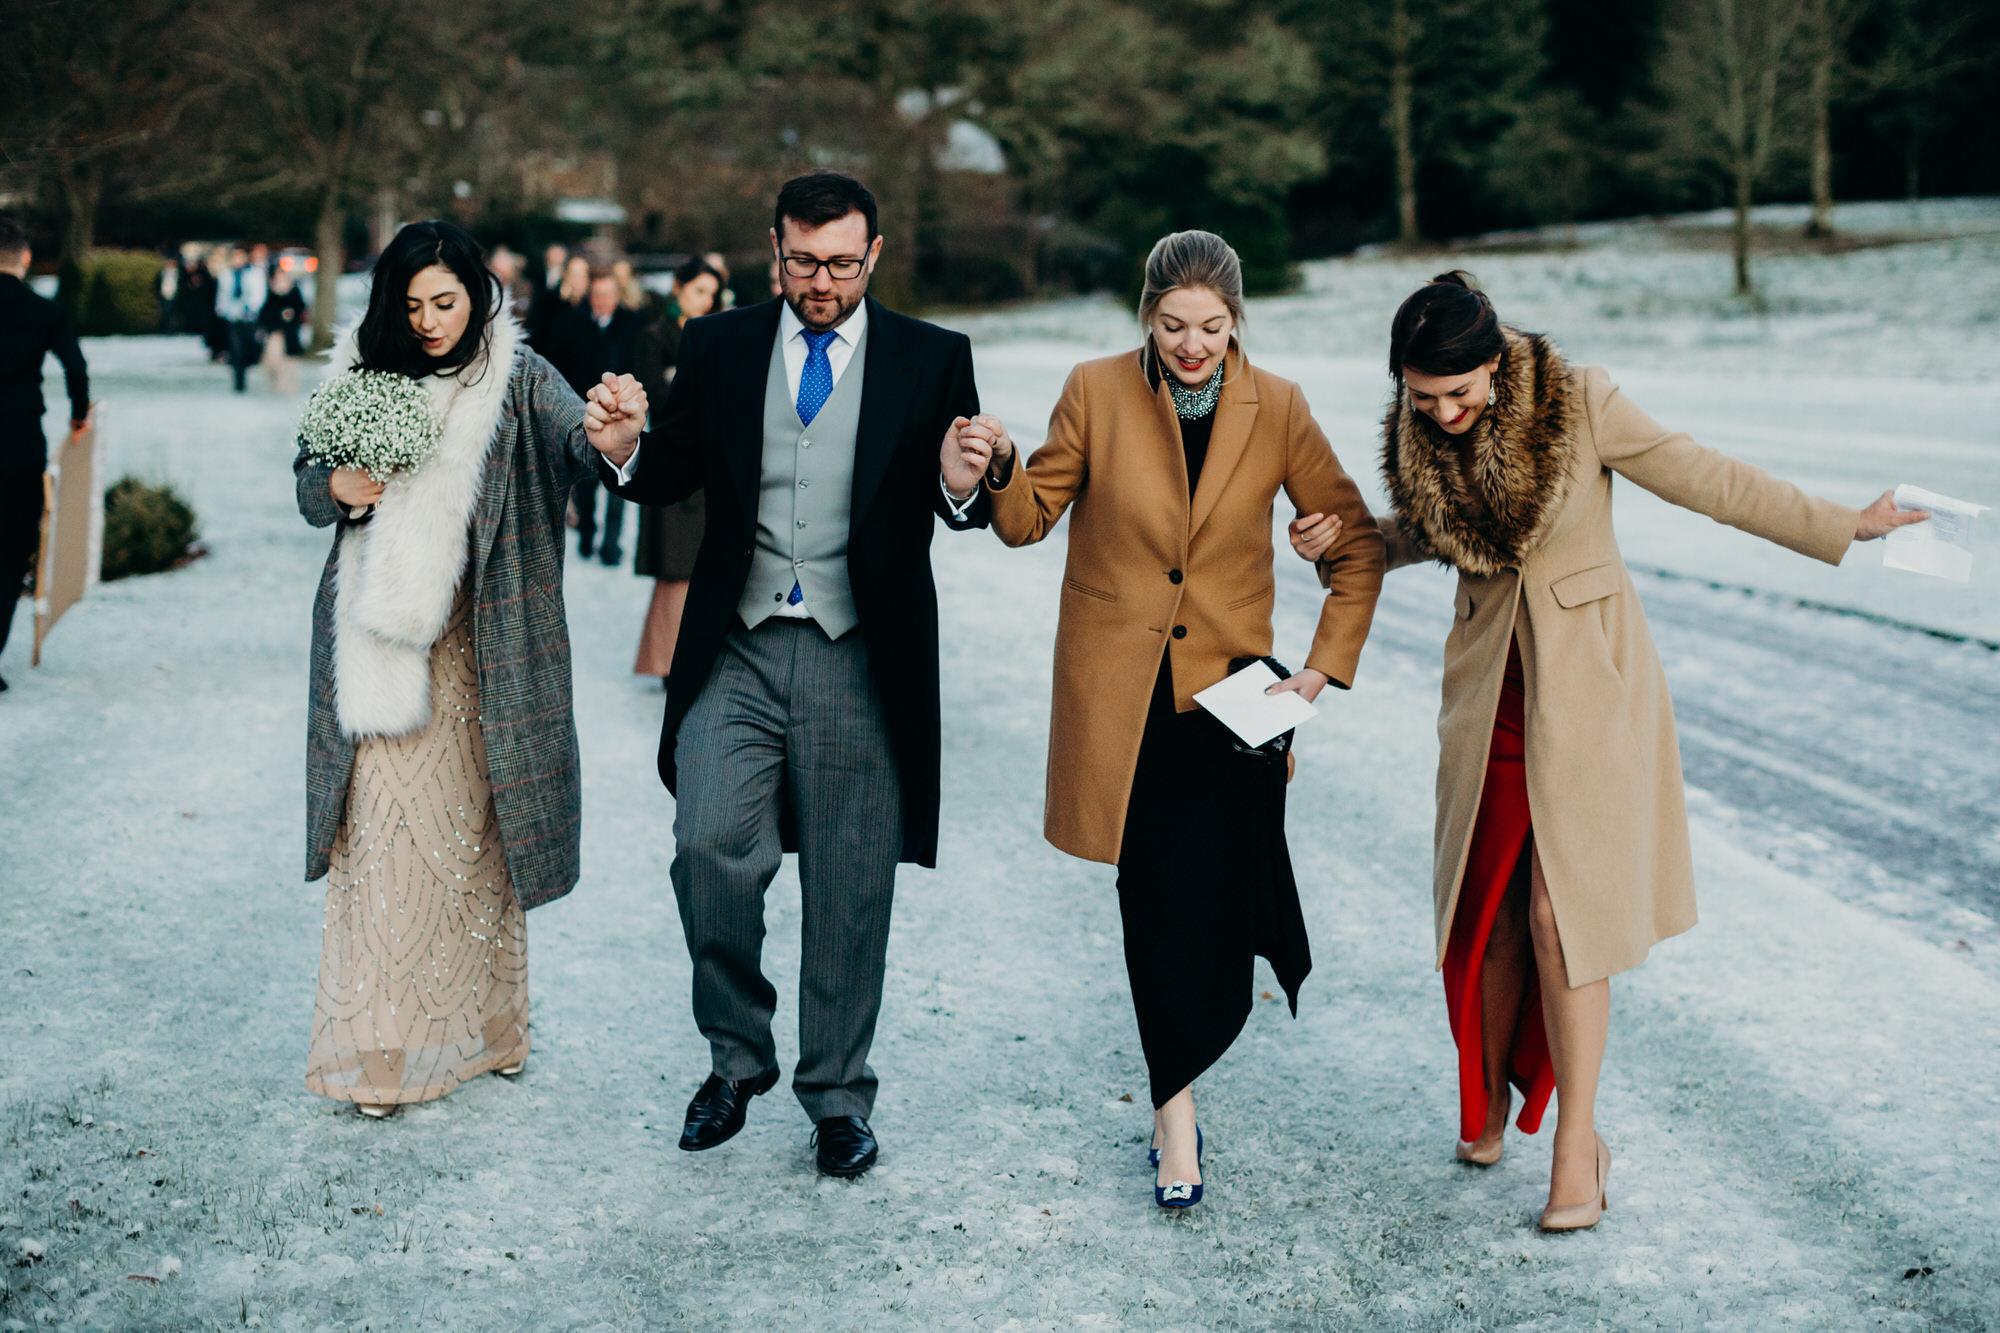 Duntreath Castle winter wedding